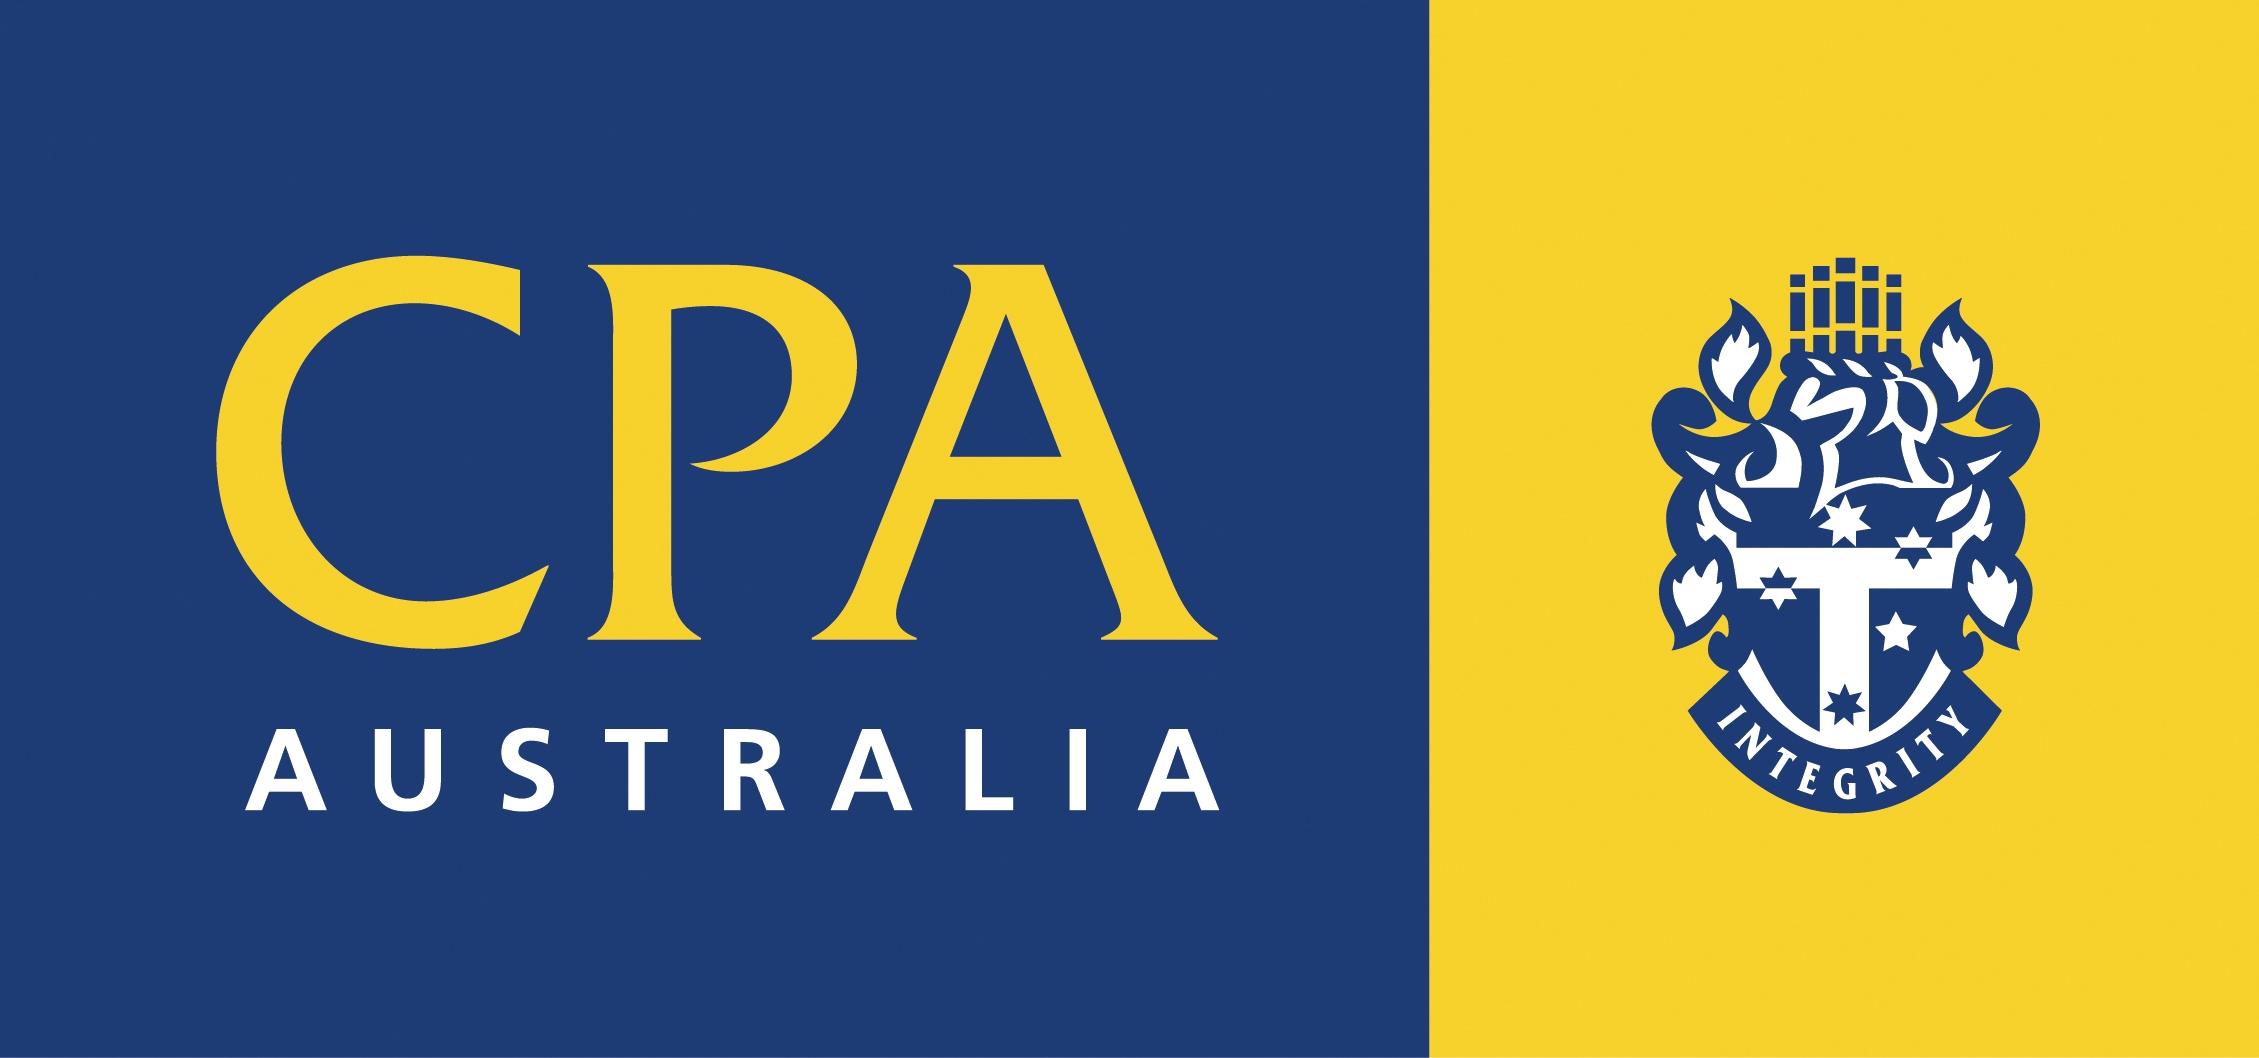 CPA Australia logo.